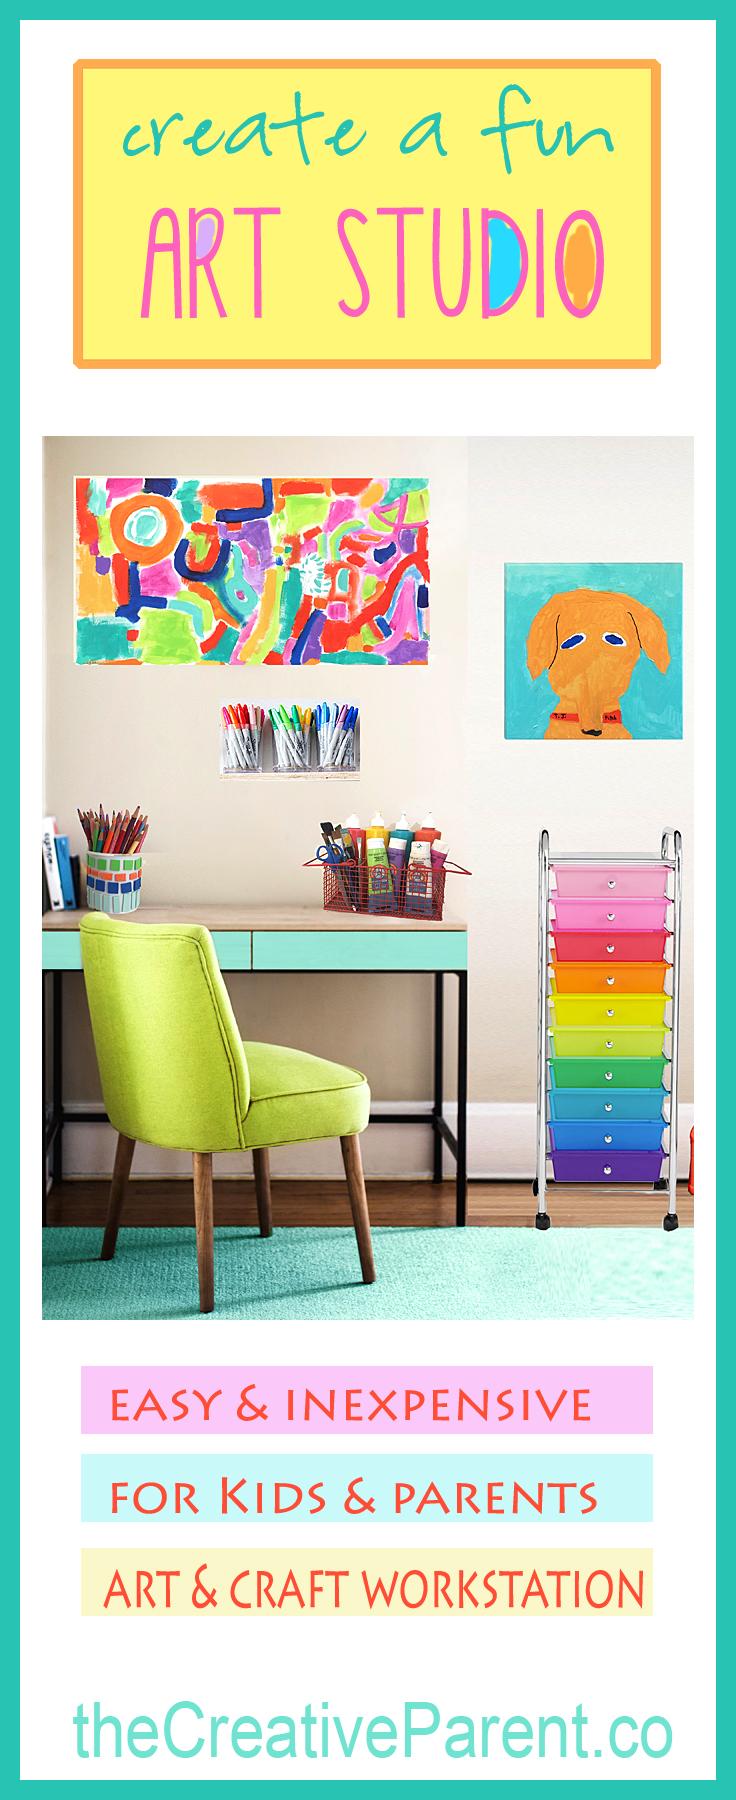 Create an Art Studio